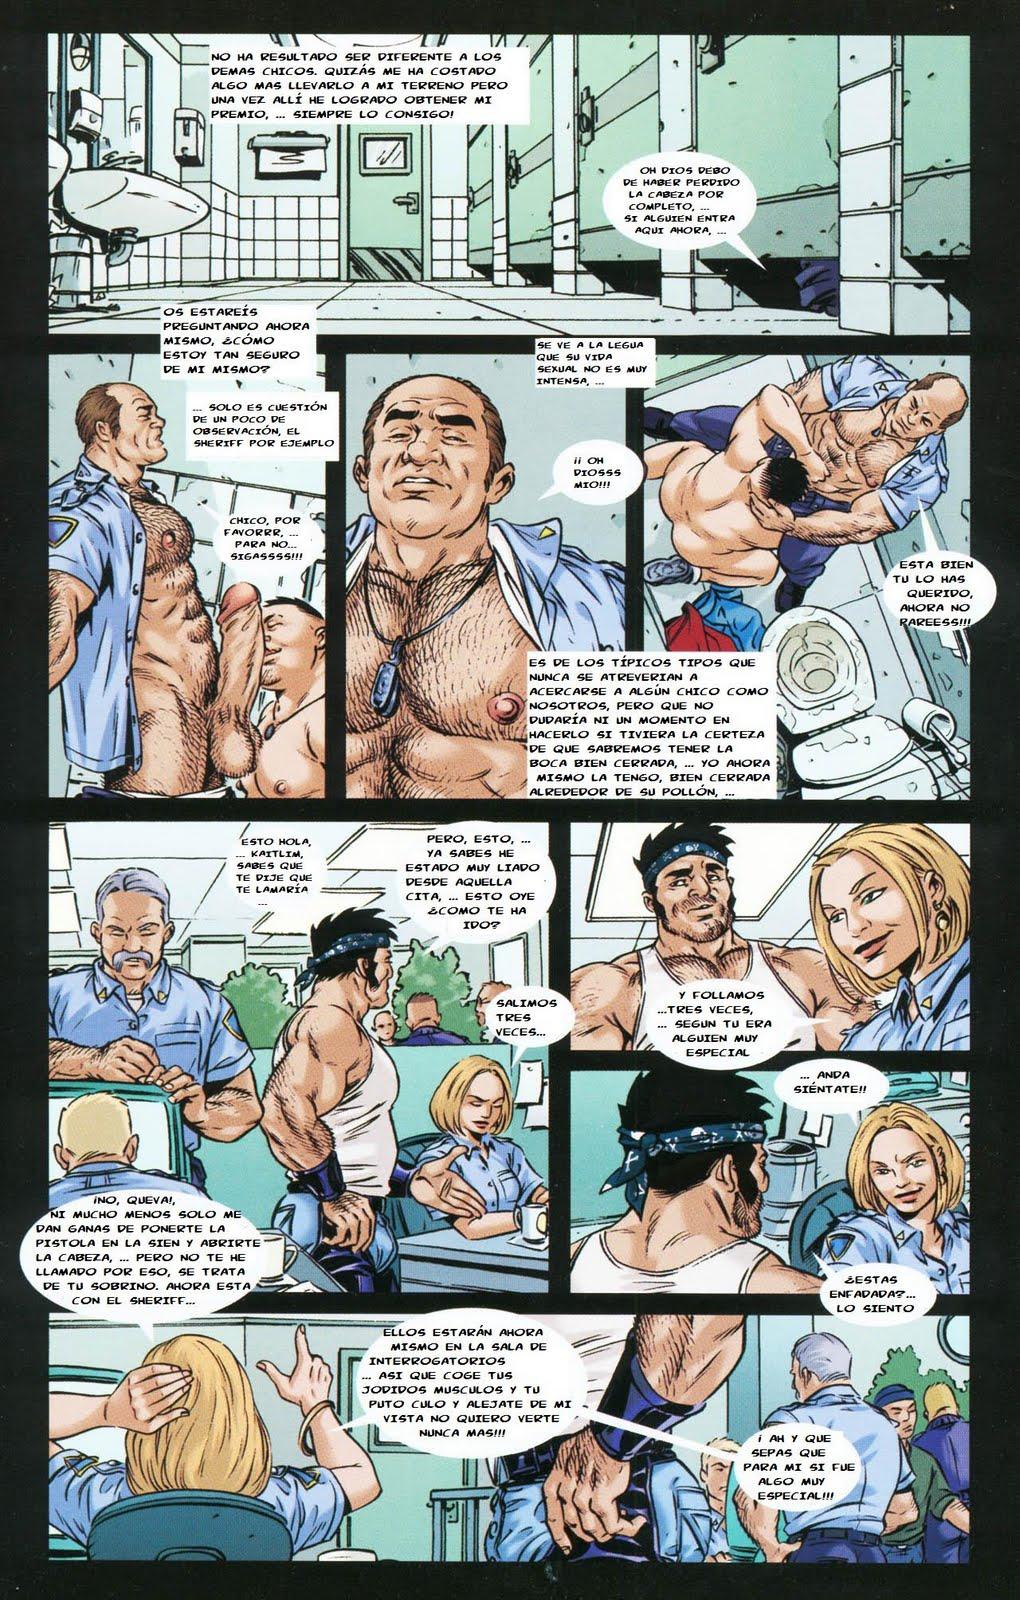 portugues porn gay em Porky comic brasil